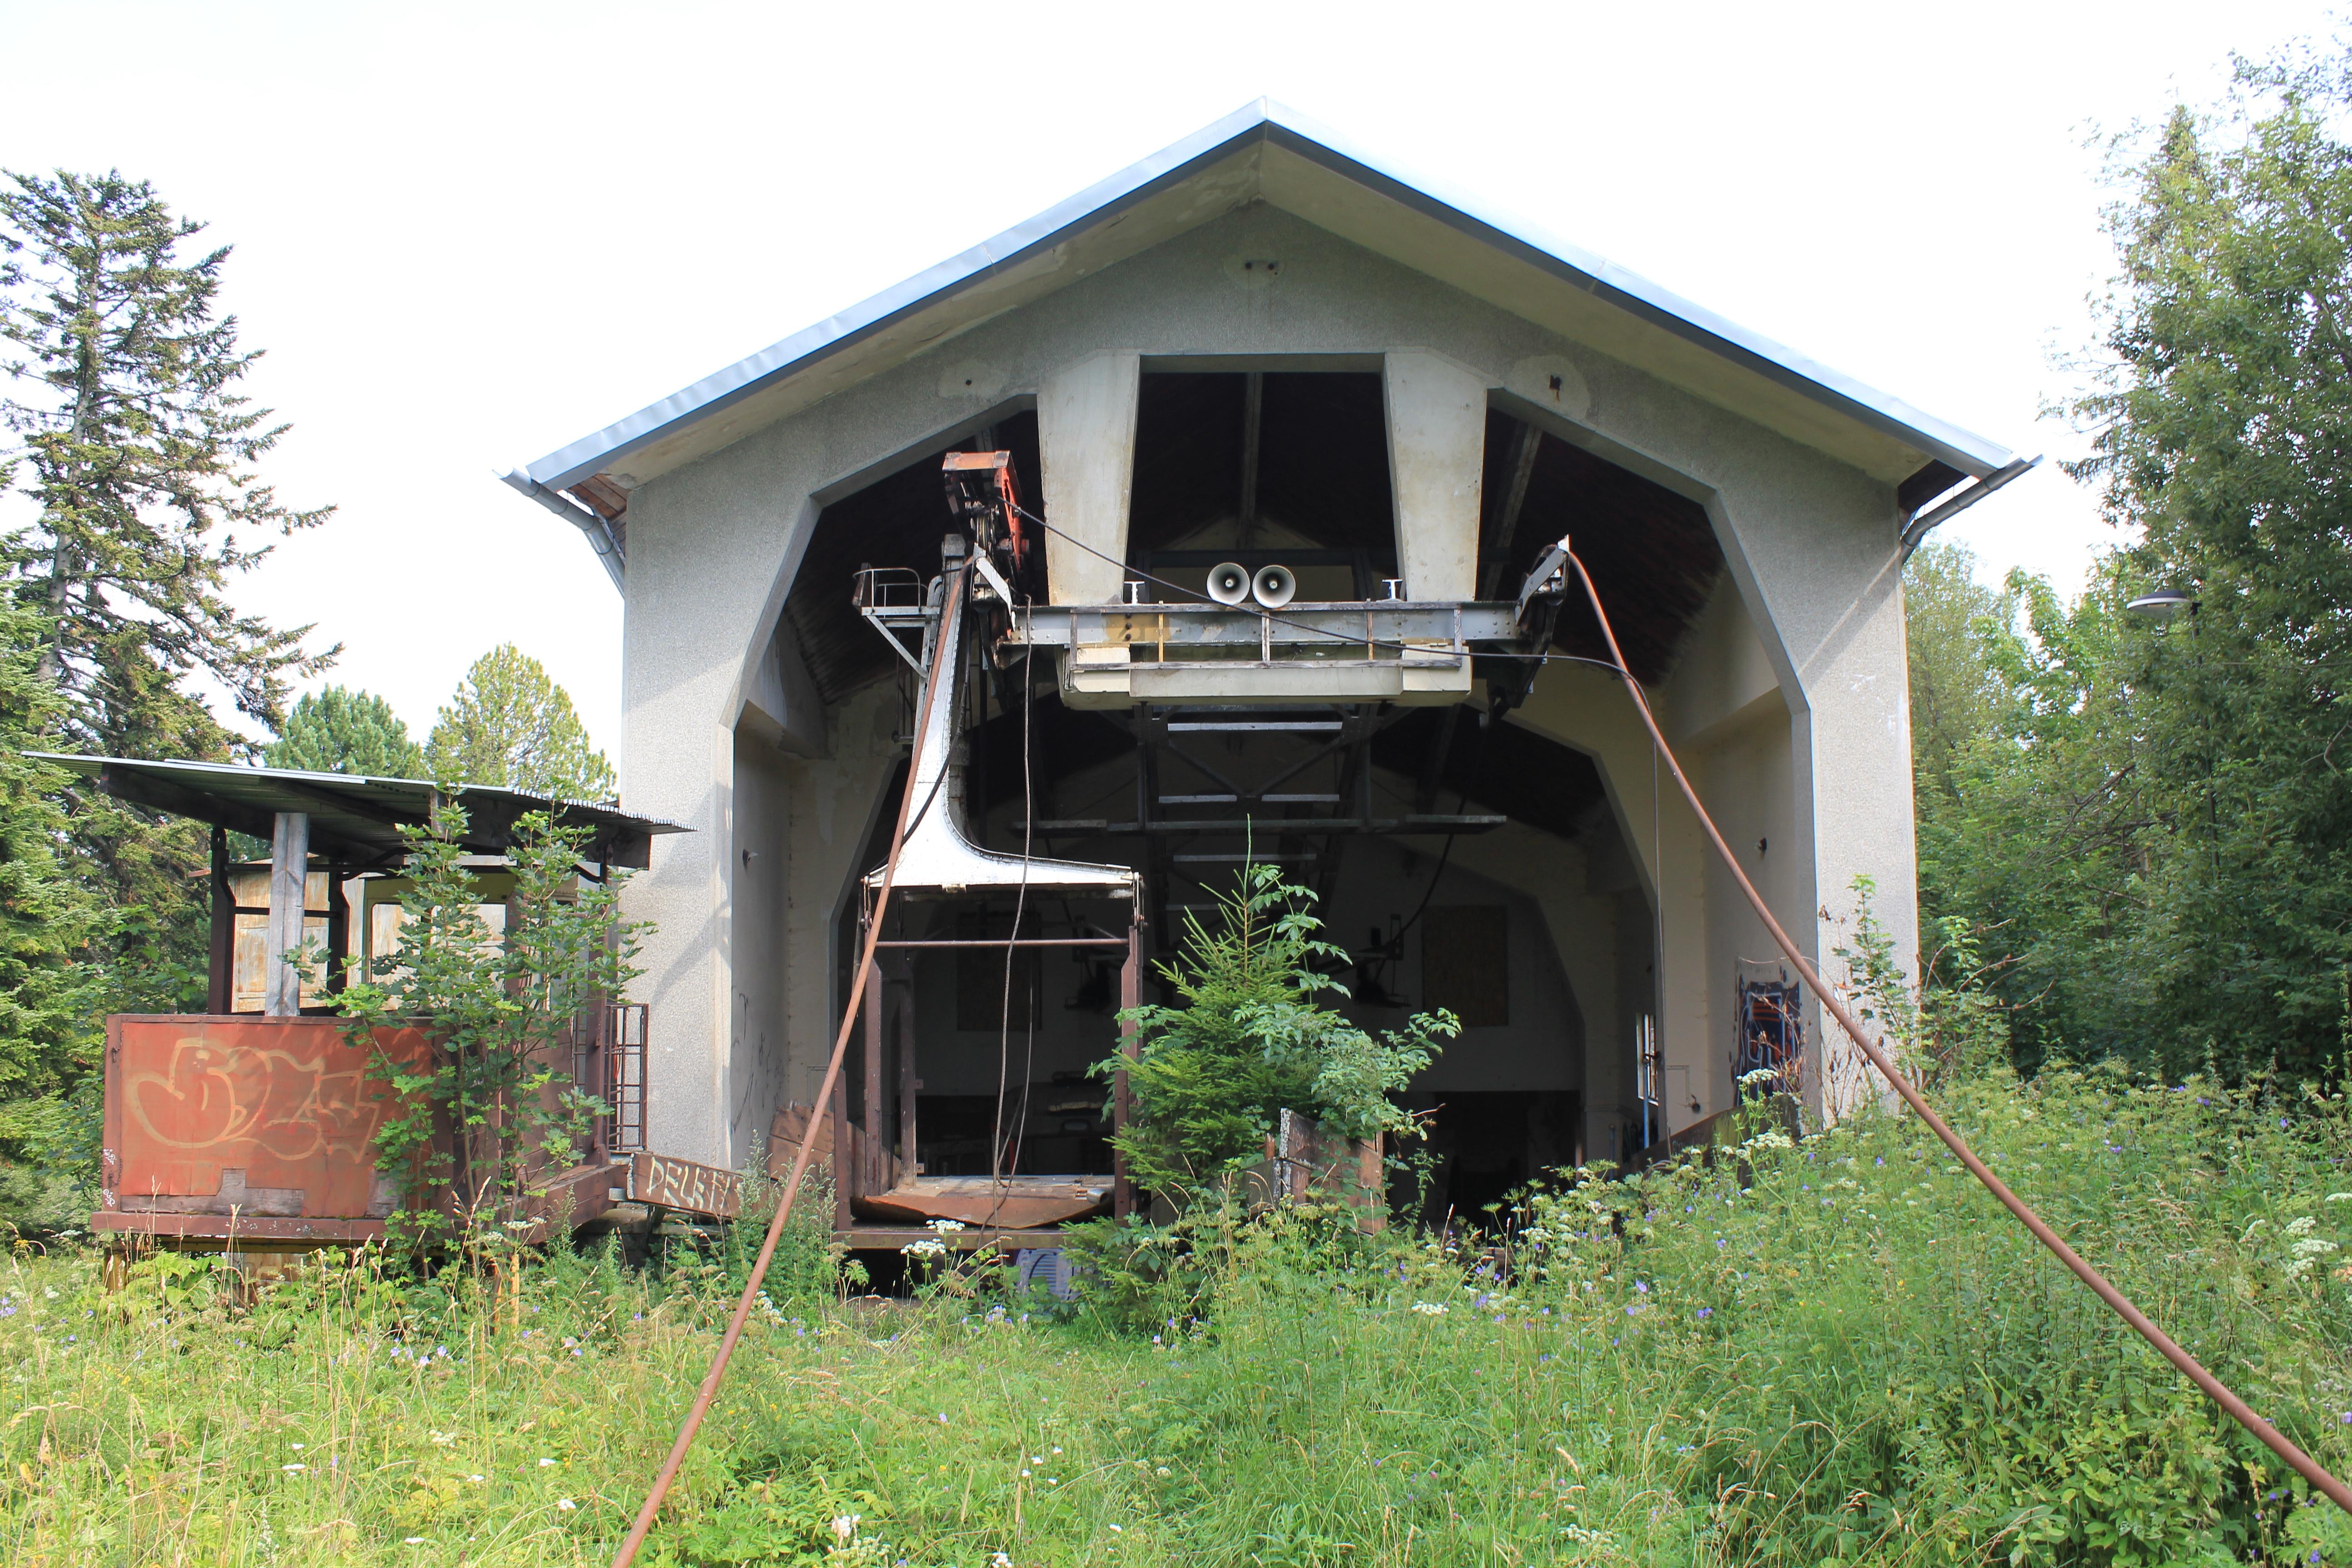 SLOw Tatra lomnica kabelbaan verval gezien (6) - kopie